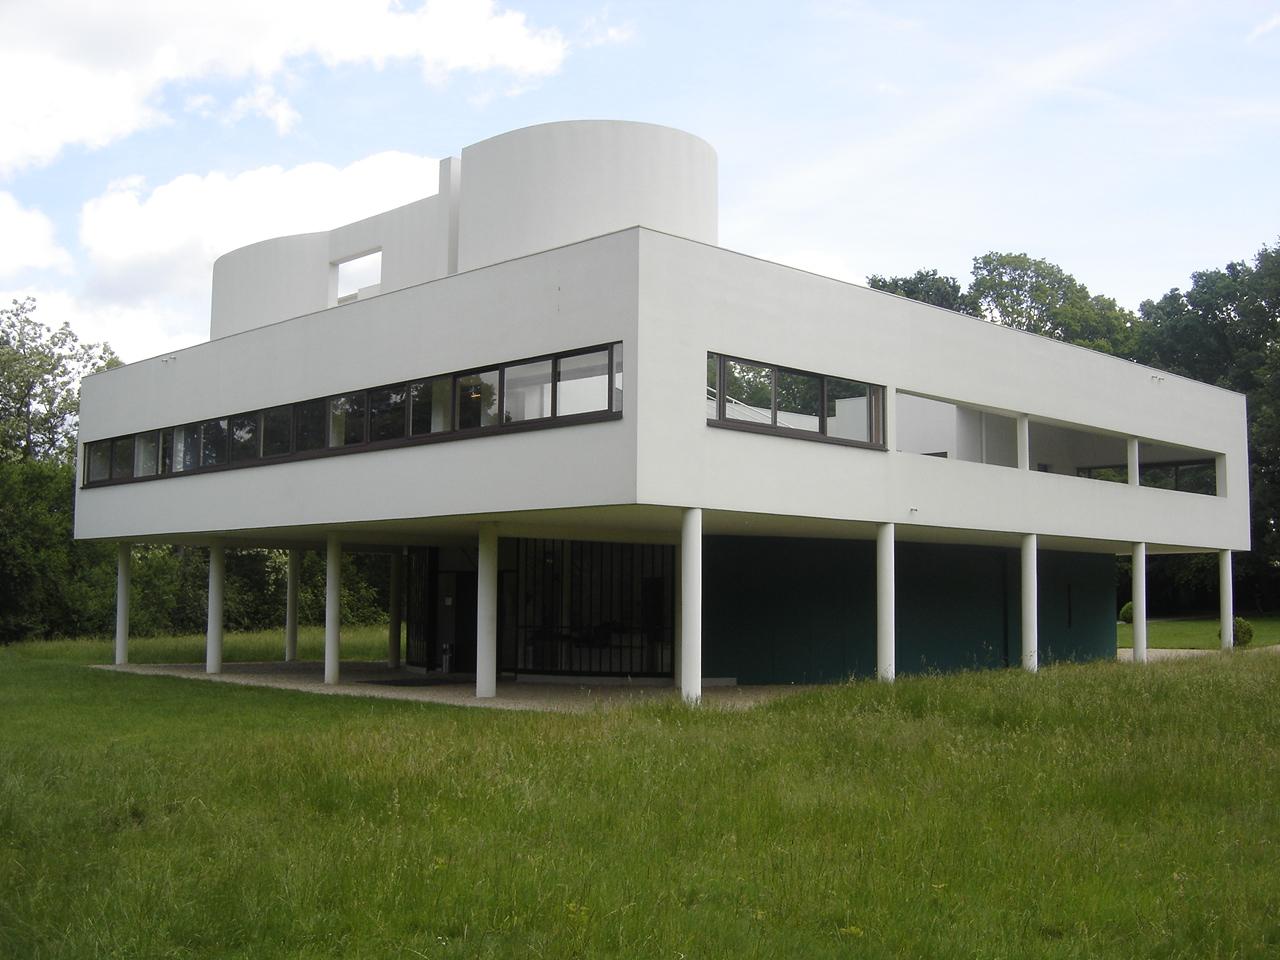 Villa savoye le corbusier a photo on flickriver - Le corbusier villa savoye ...